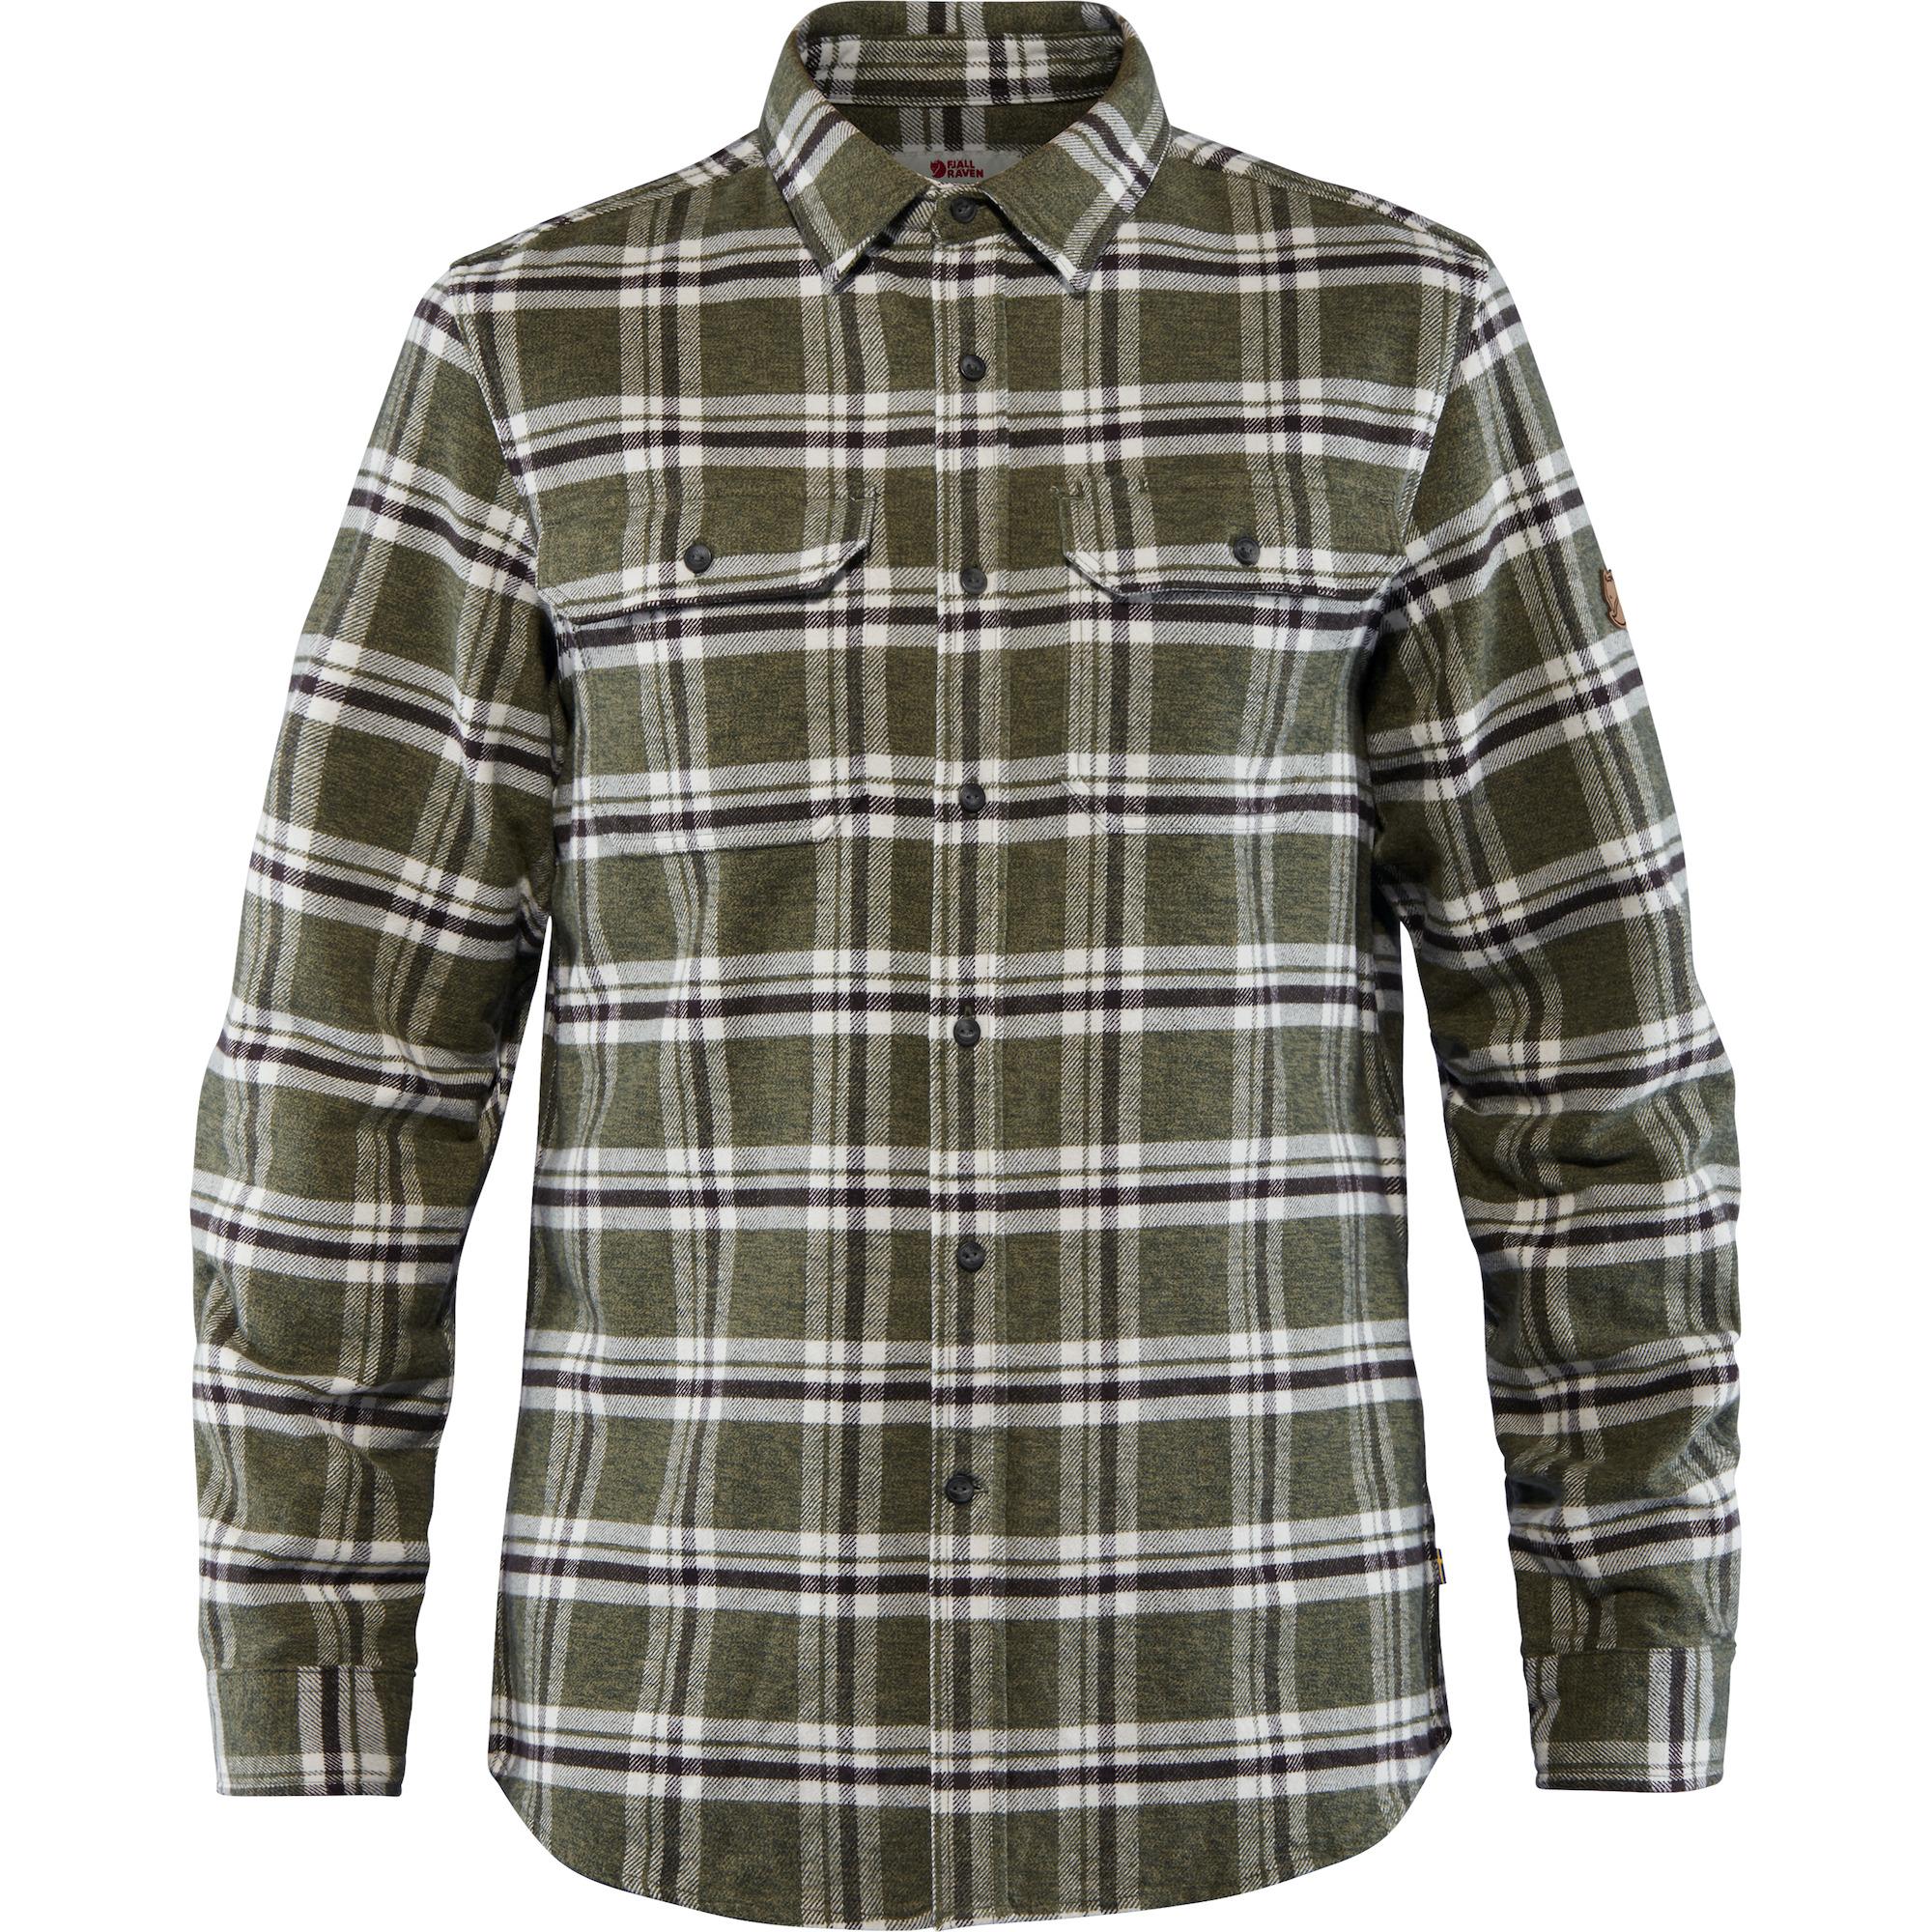 MID SEASON SALE Fjallraven Canada Shirt Black